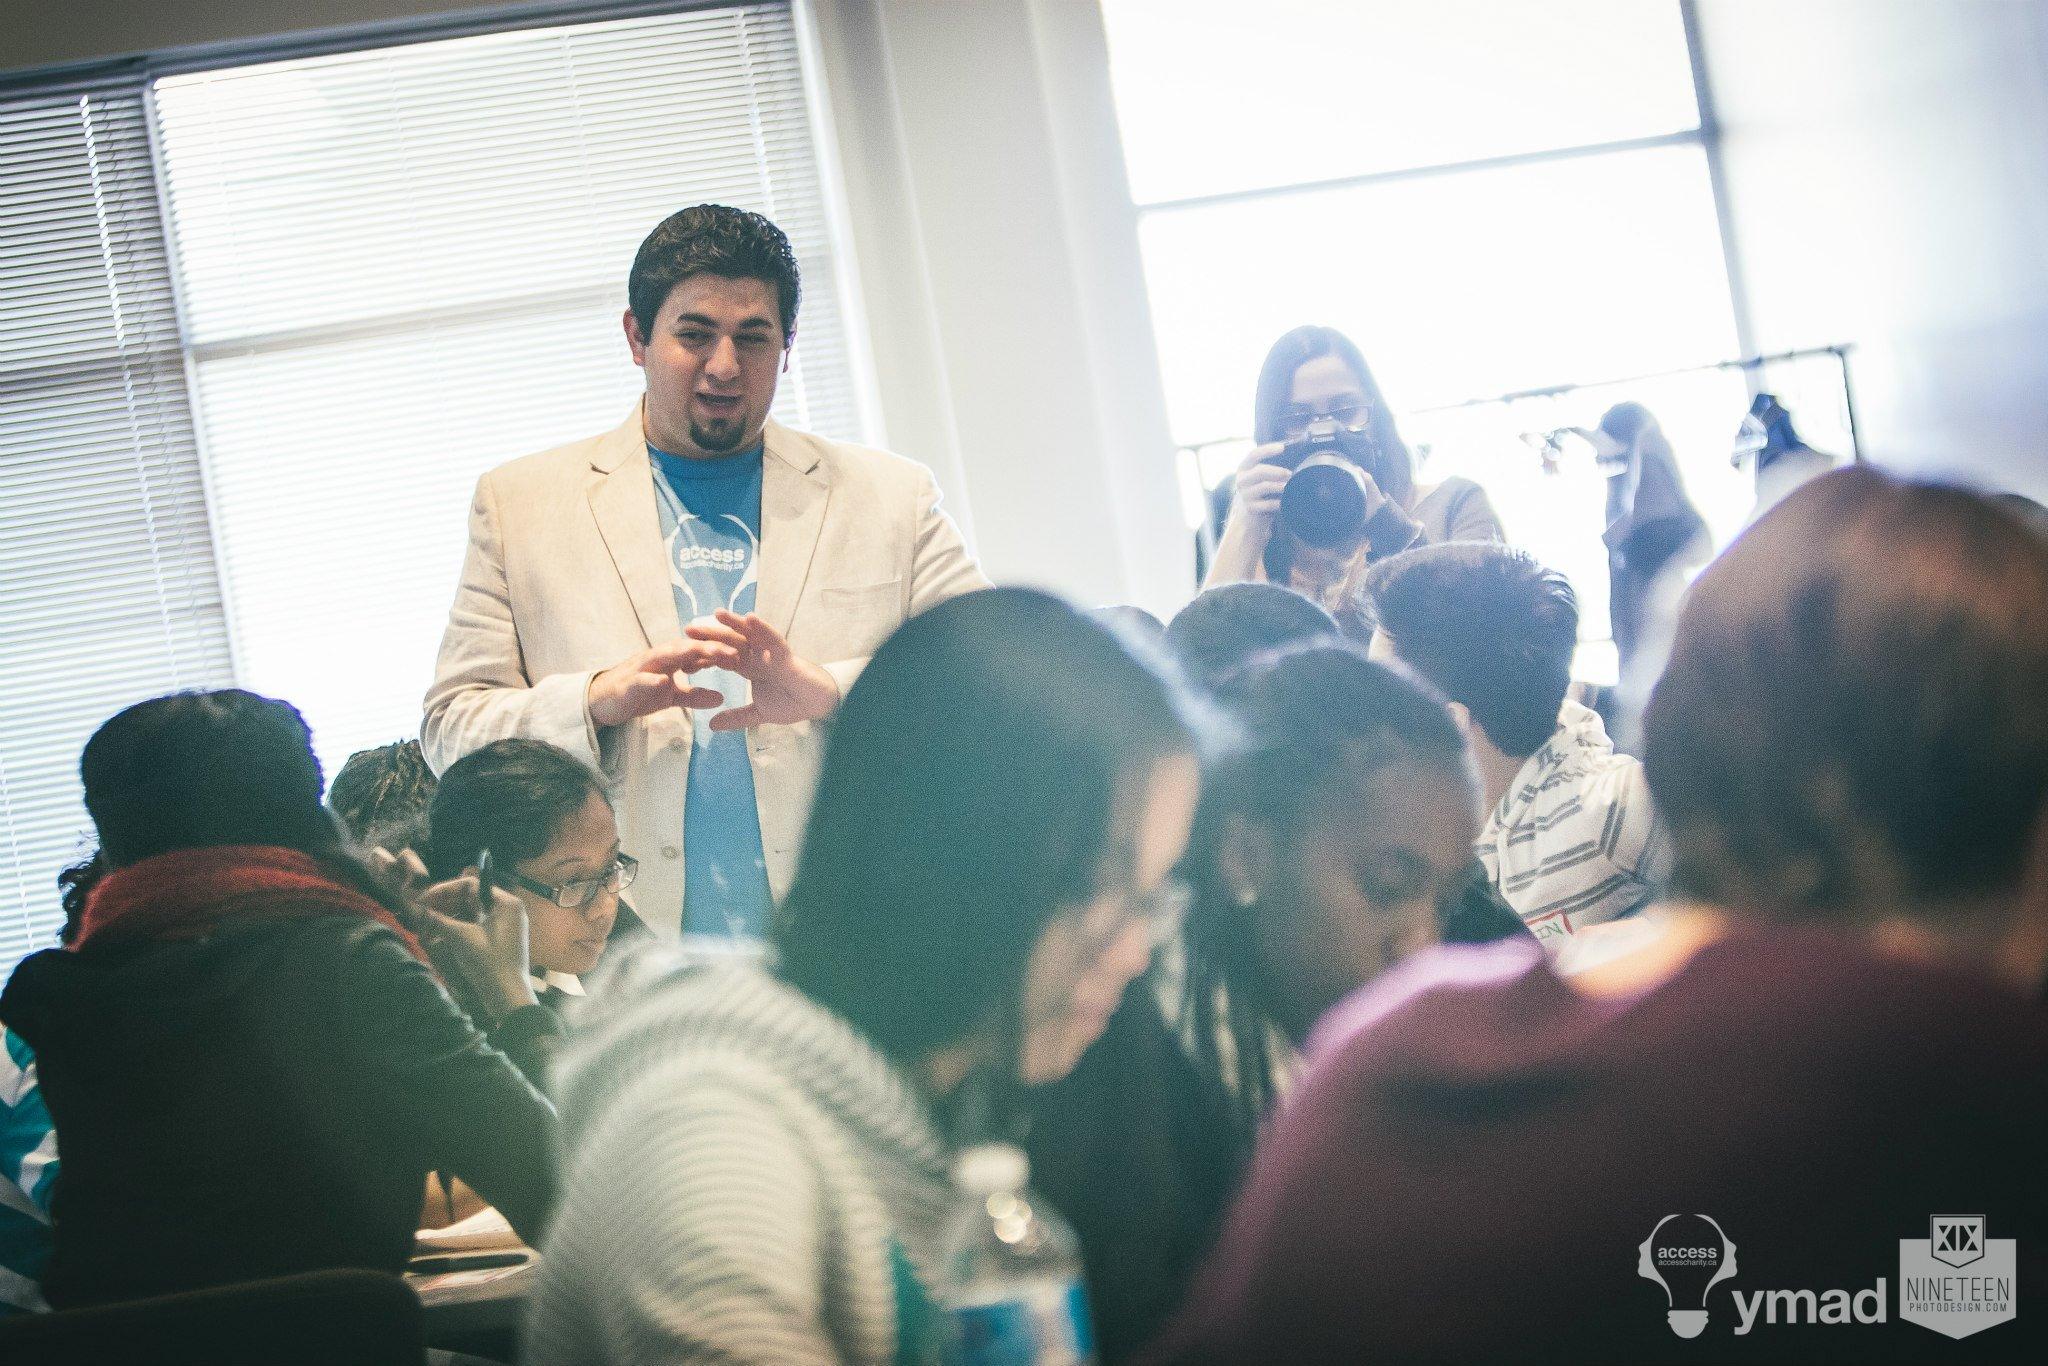 Helping millennials develop their ideas for social change through ACCESS